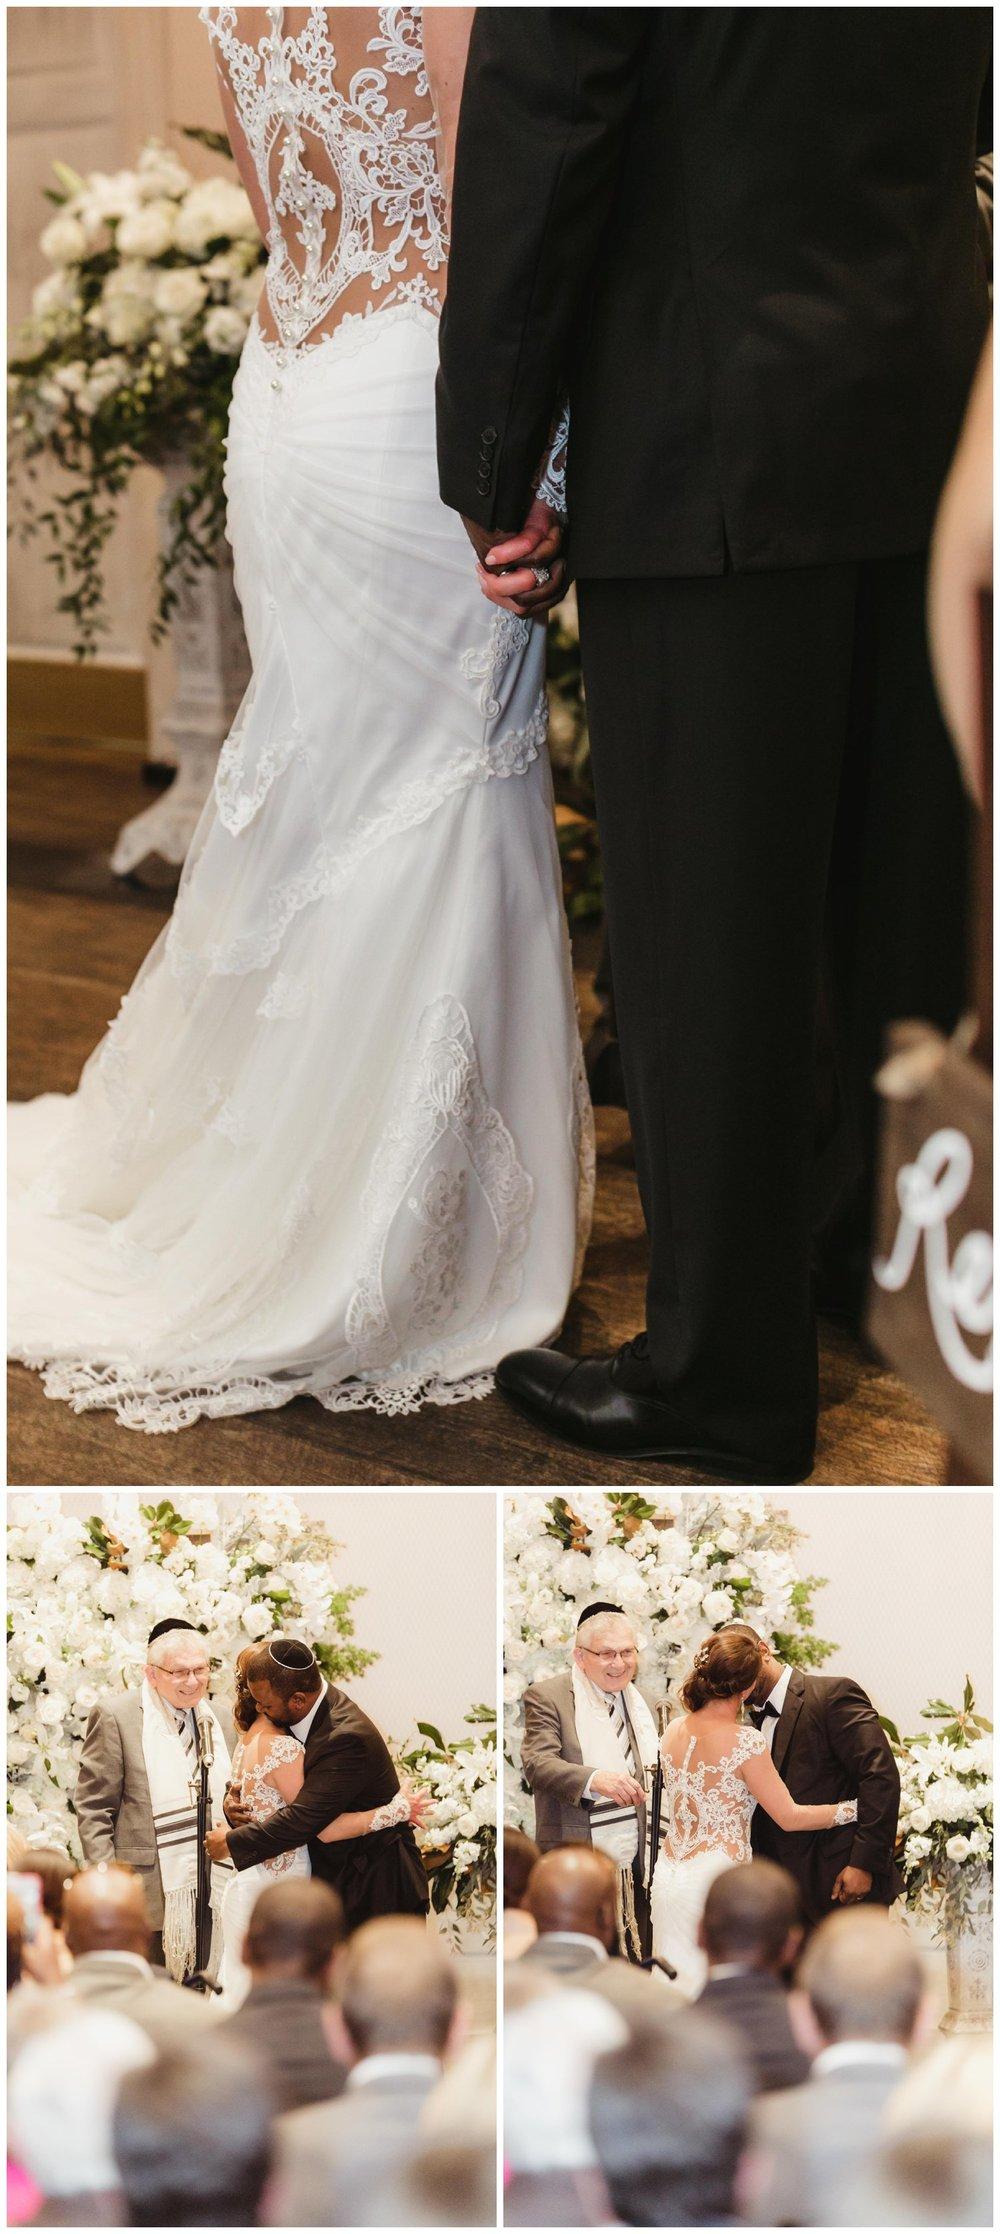 JillandLennon_TheReeds_ShelterHaven_StoneHarbor_NJ_NewJersey__SouthJersey_Wedding_Photographer_MagdalenaStudios_0319.jpg